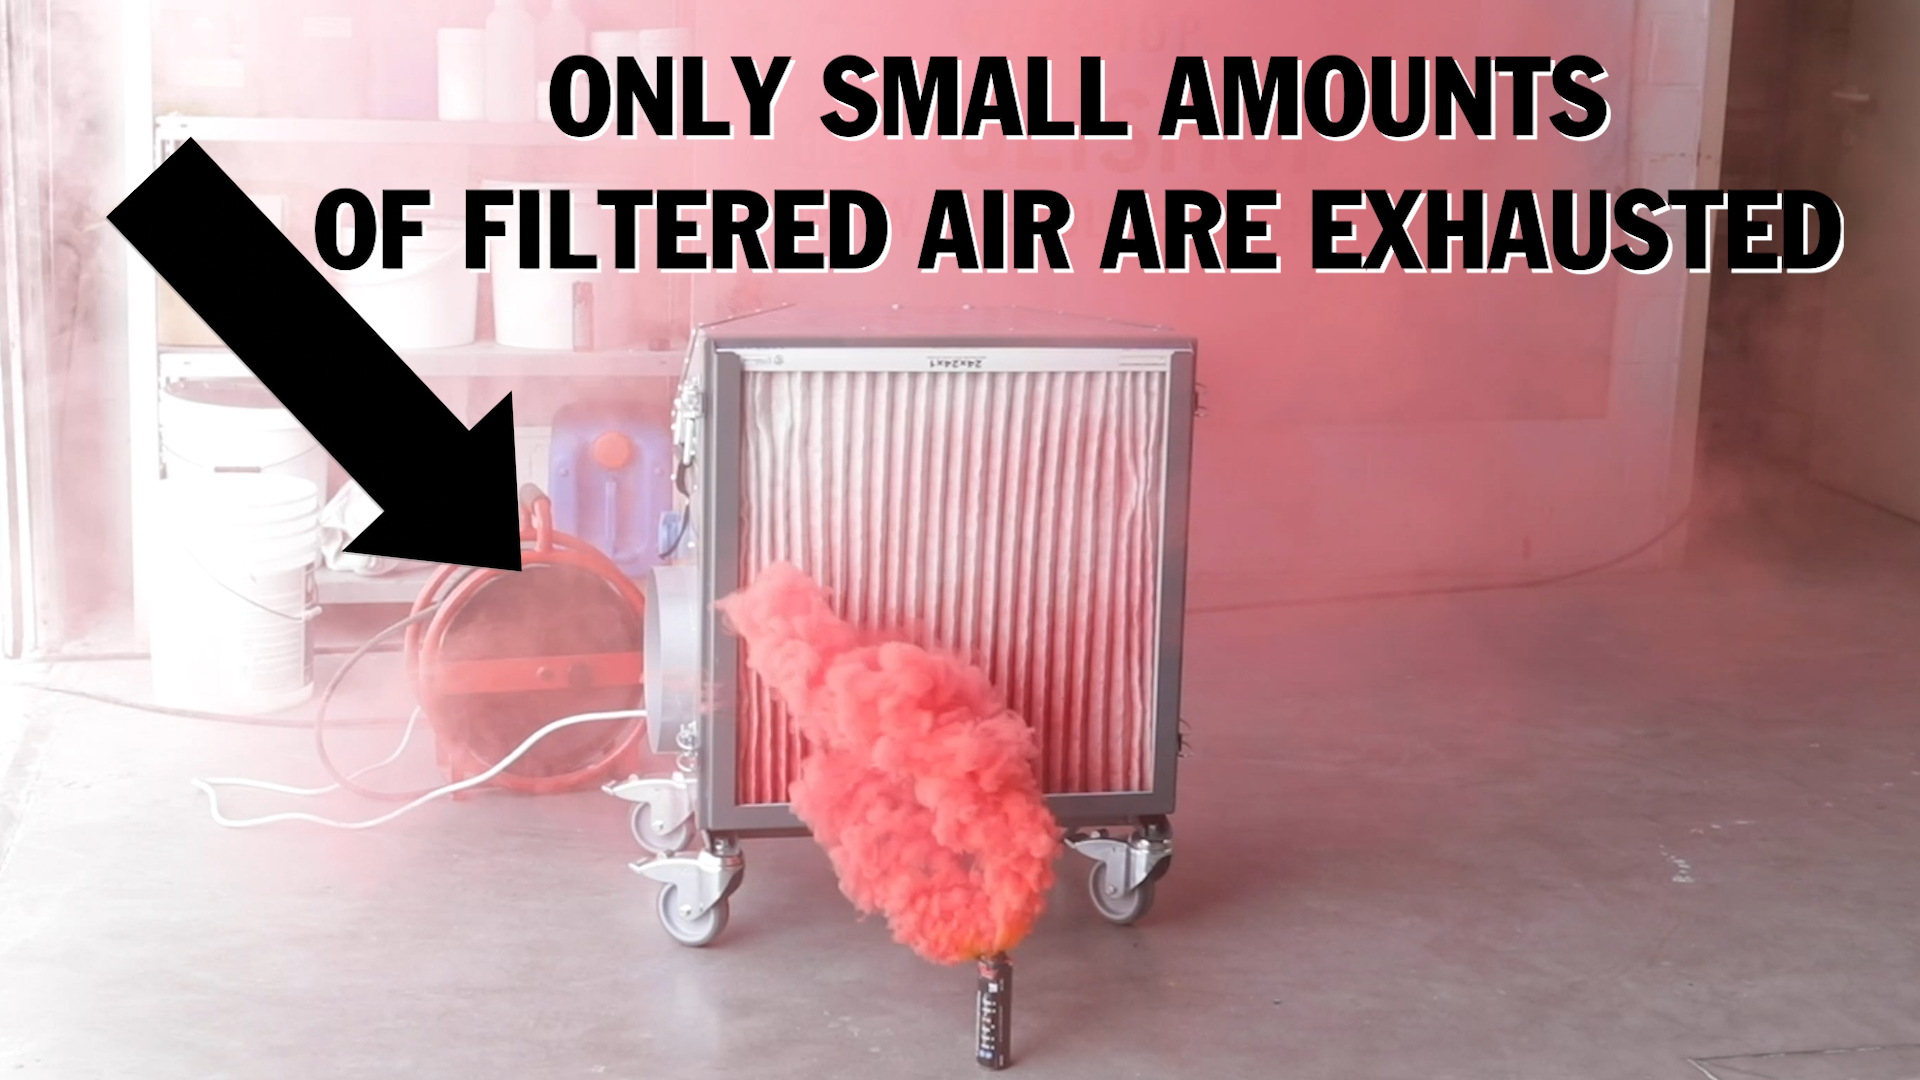 Lavina Air Scrubber vs. Smoke bomb